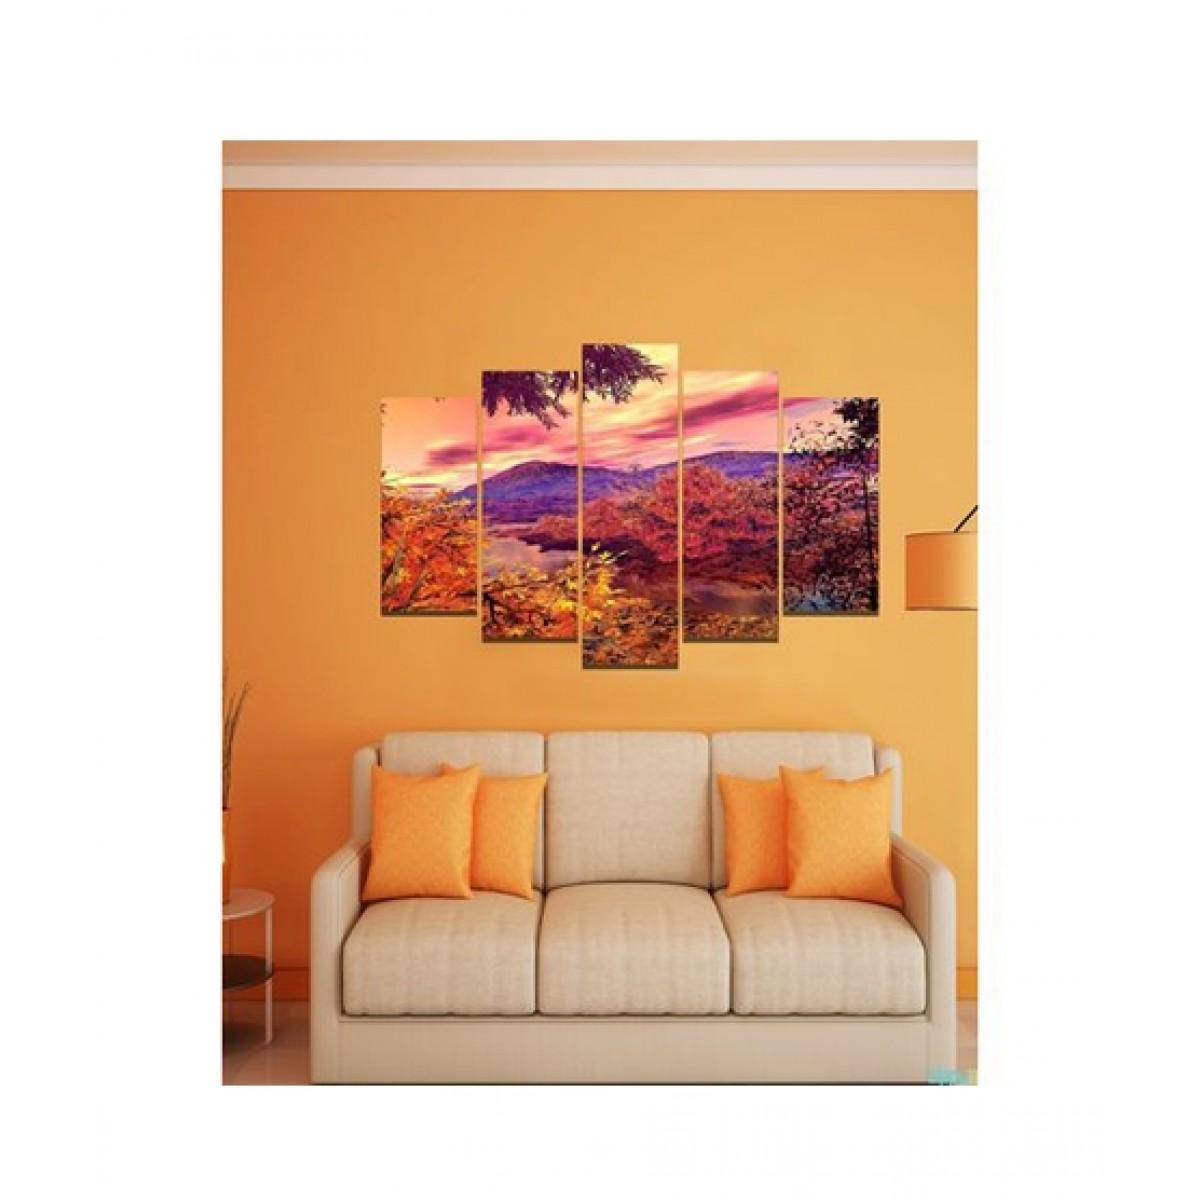 BednShines Digitally Printed Canvas Wall Frames Set Of 5 (EI-0233)